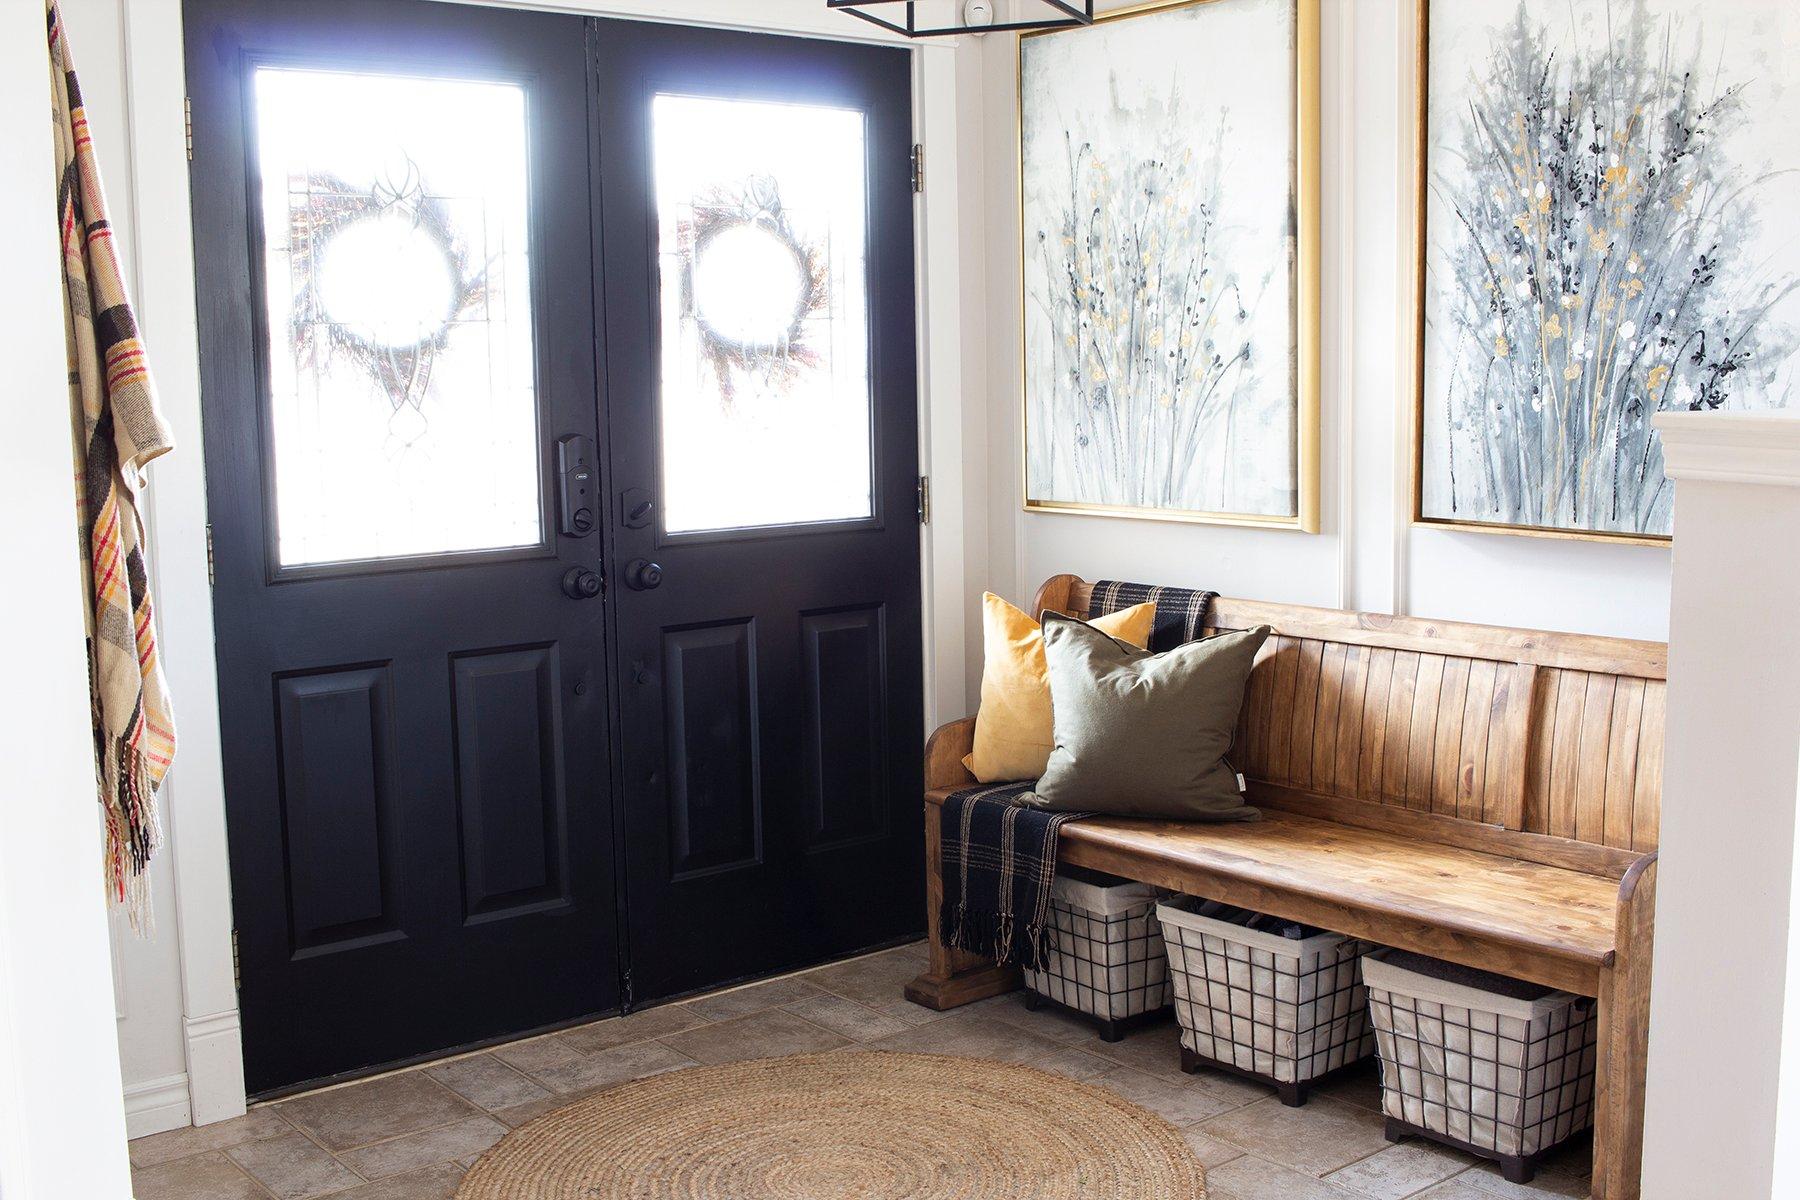 cozy entryway with black double doors